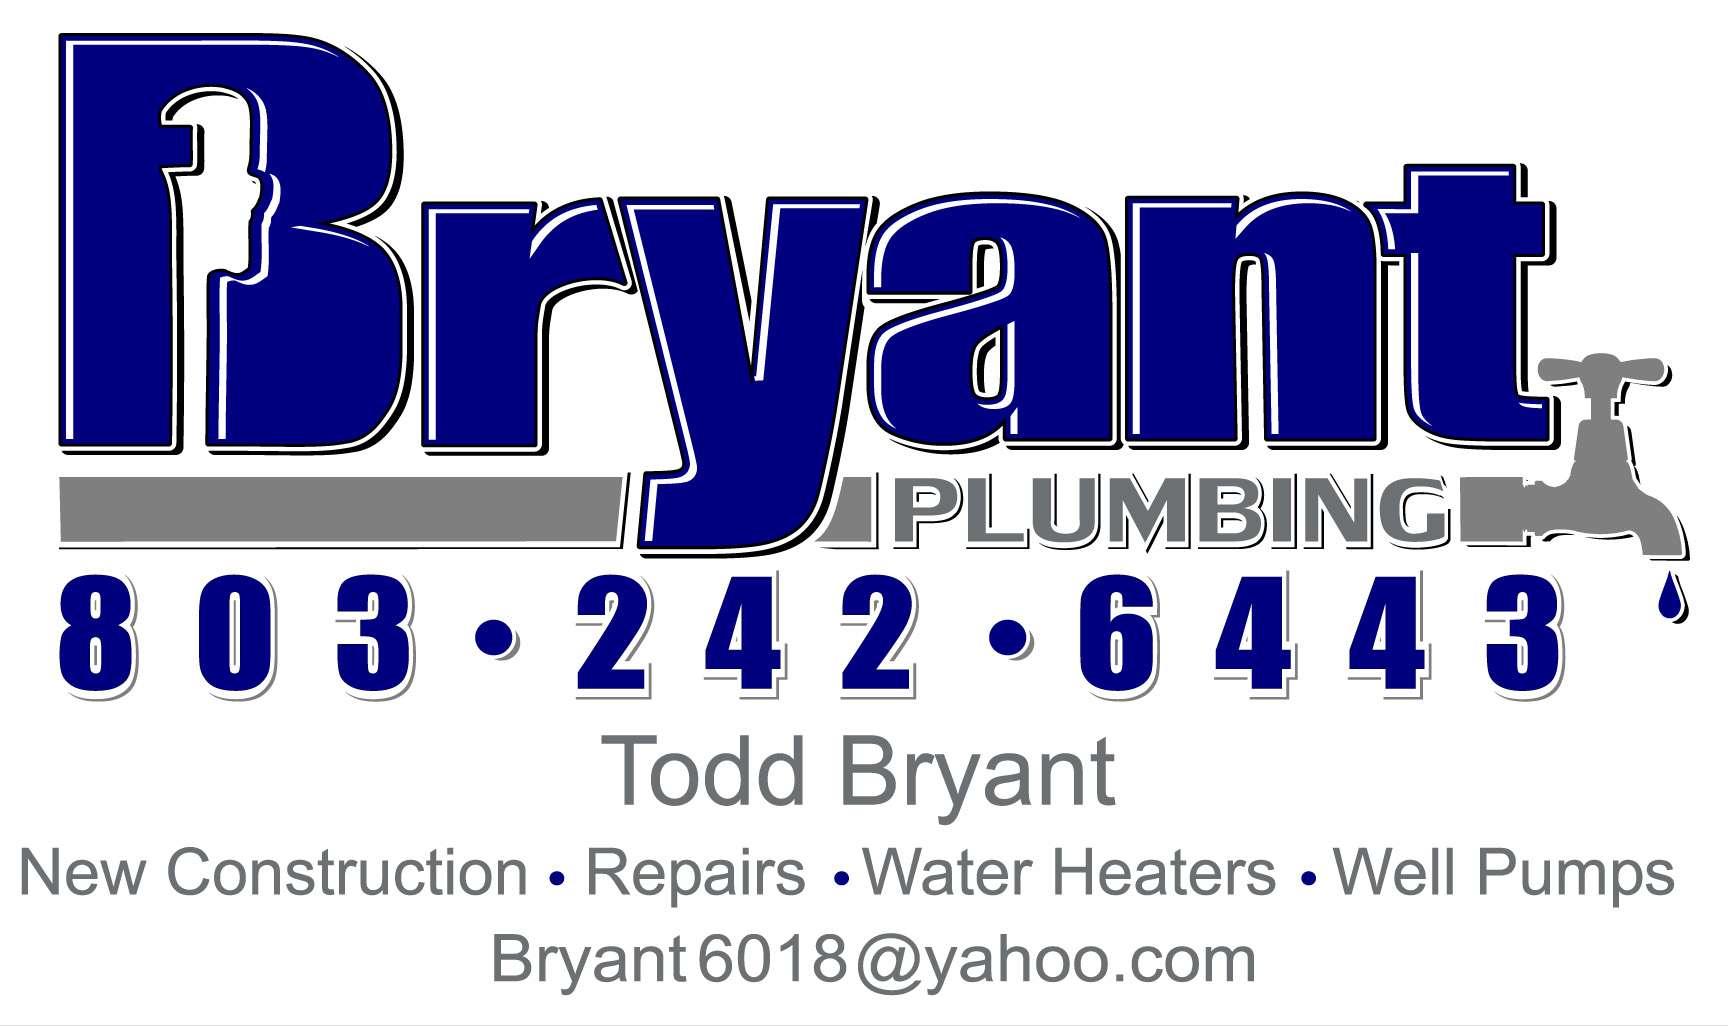 Bryant Plumbing